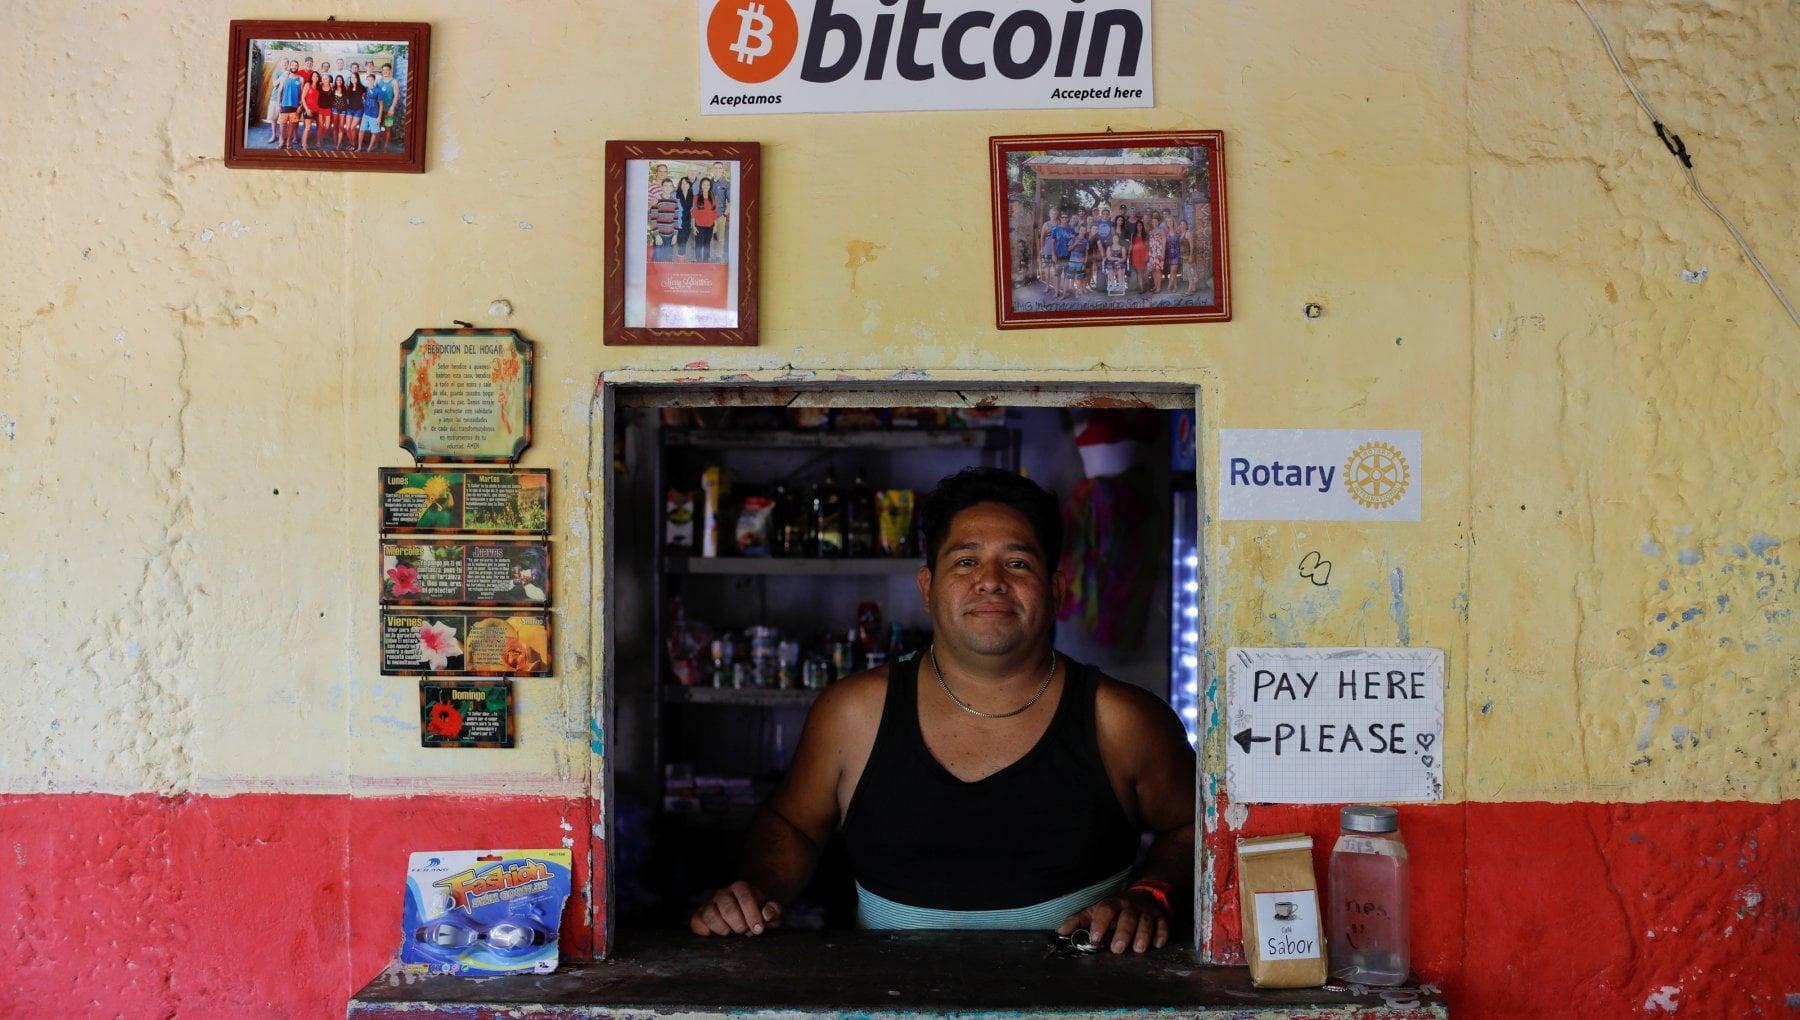 bitcoin status giuridico per paese)